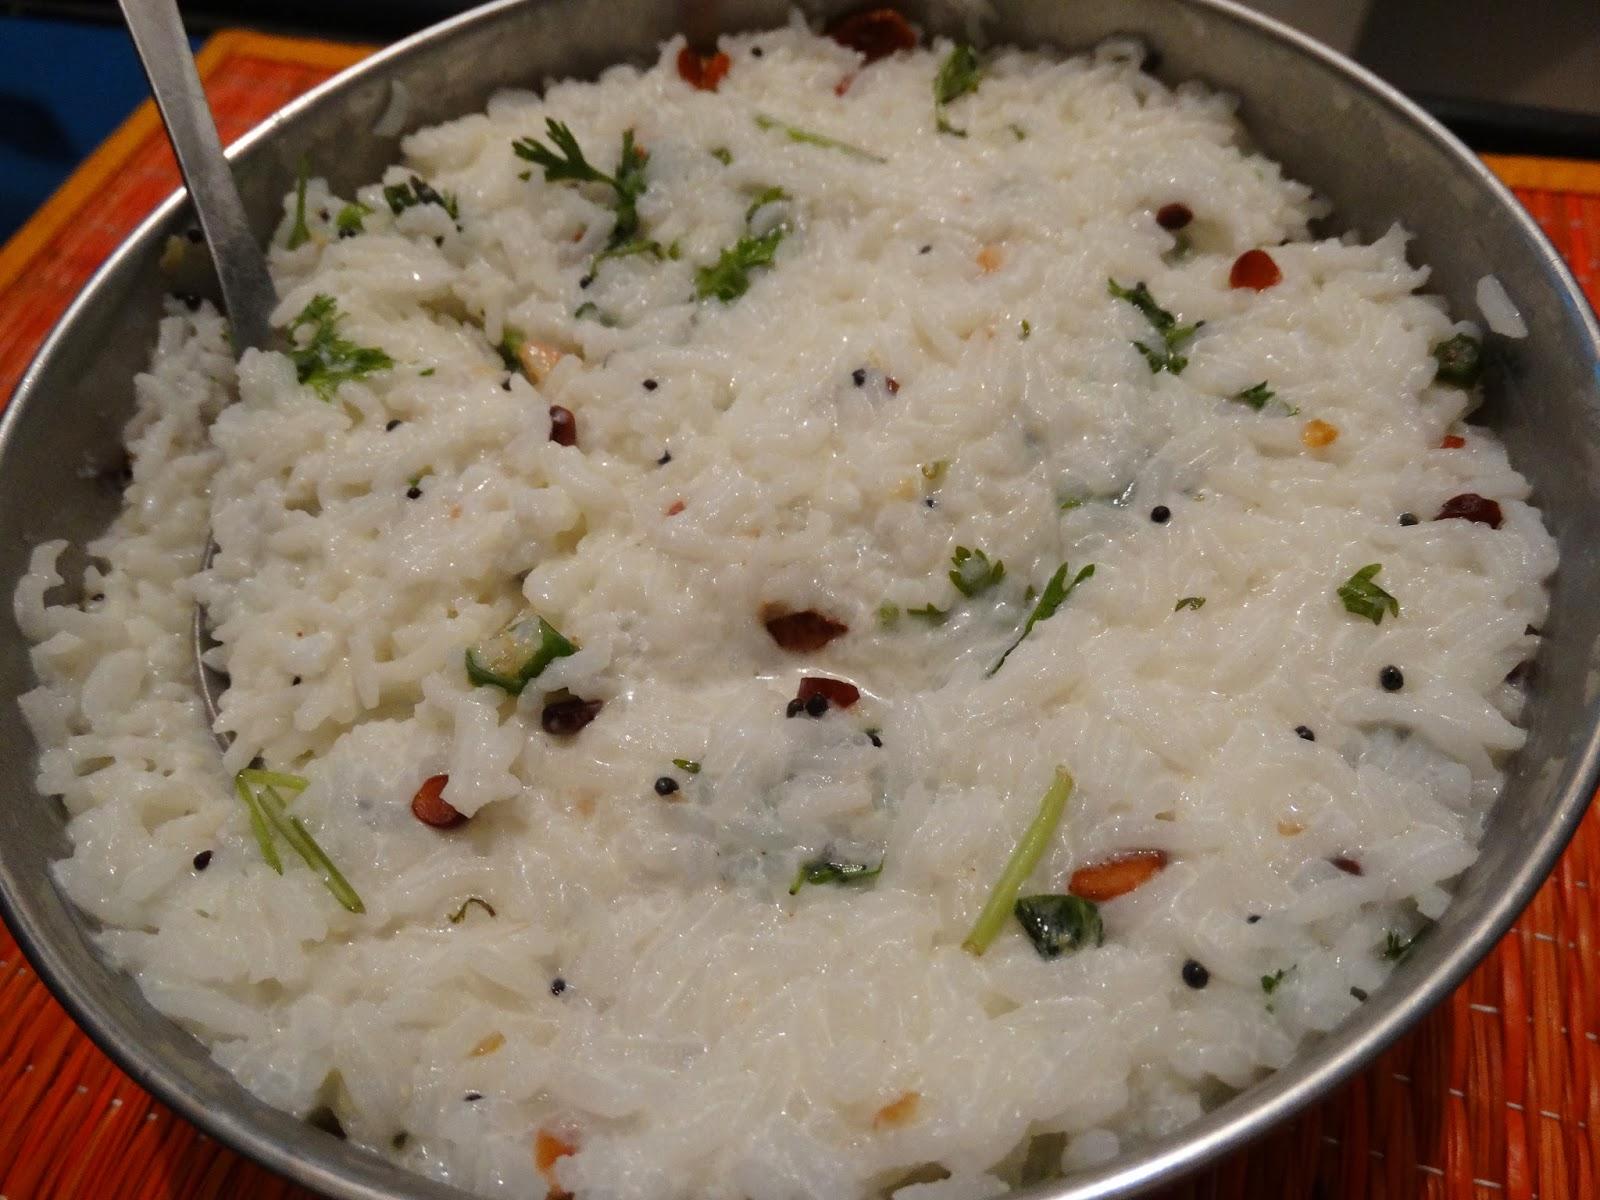 rainingfood.com curd rice